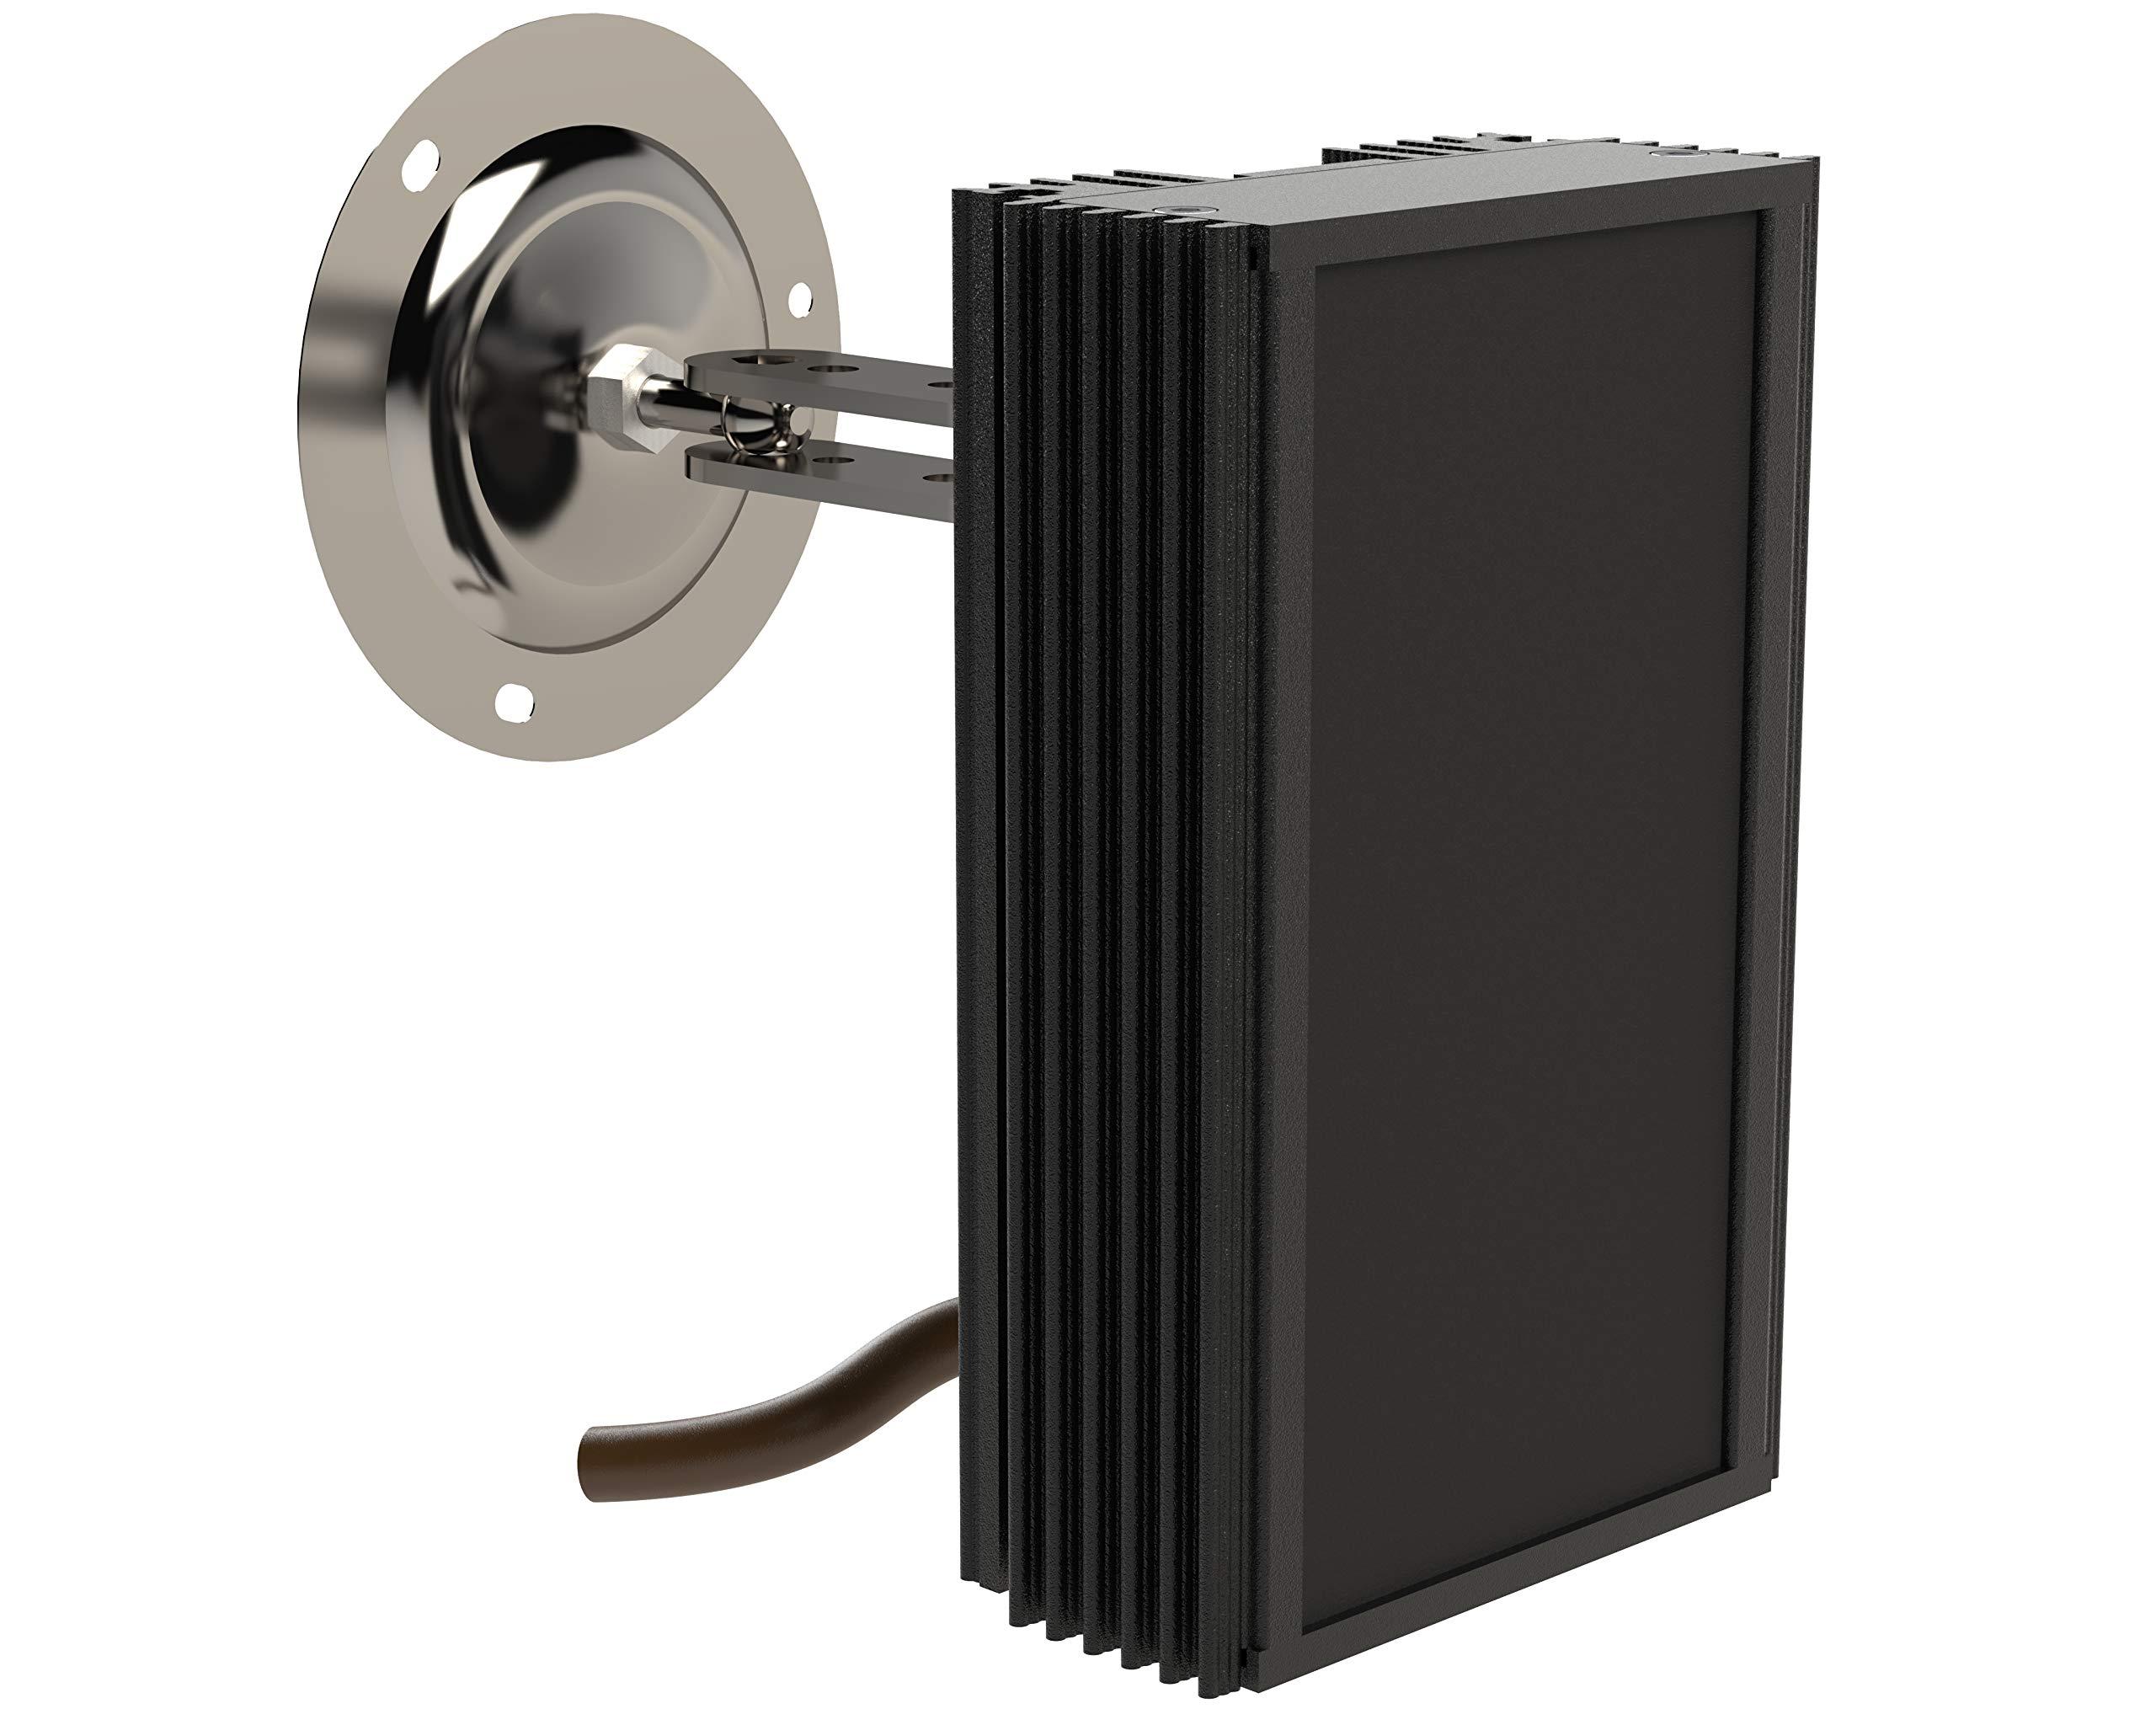 Infrared Illuminator Microlight IR Helios XXL-90/70 90deg Wide Angle up to 150ft Night Vision Outdoor IP67